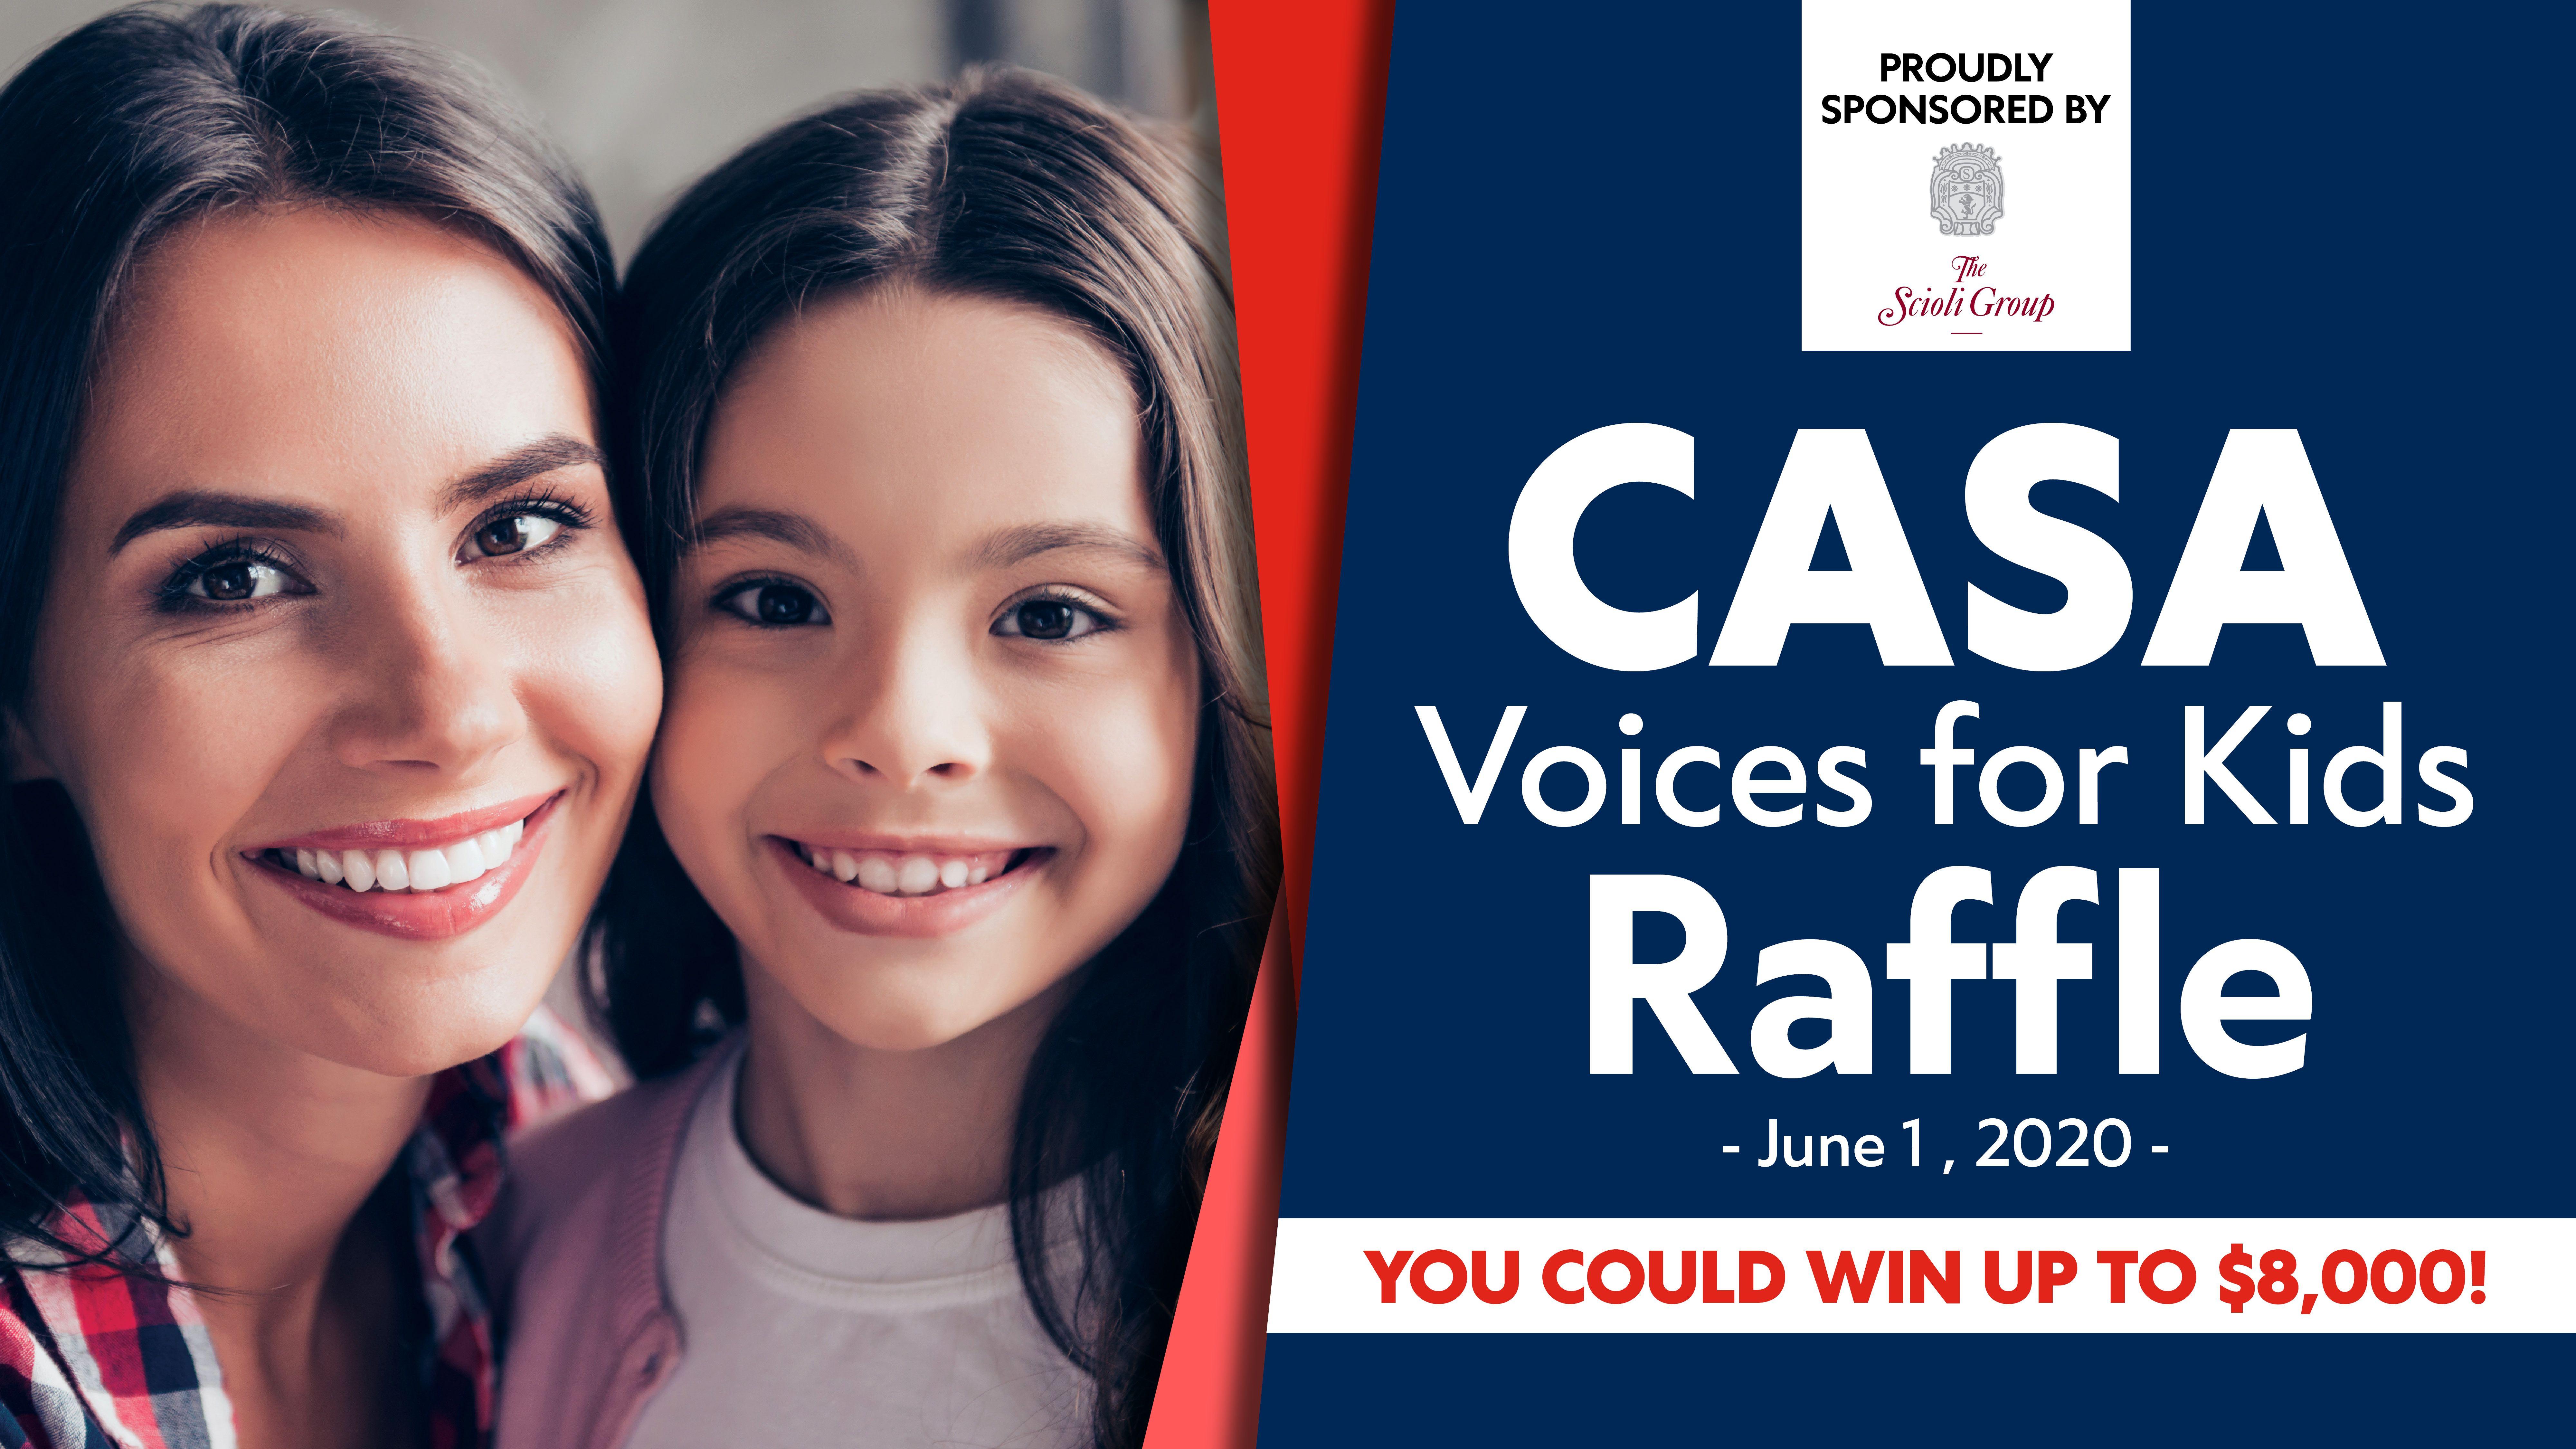 CASA Voices for Kids Raffle